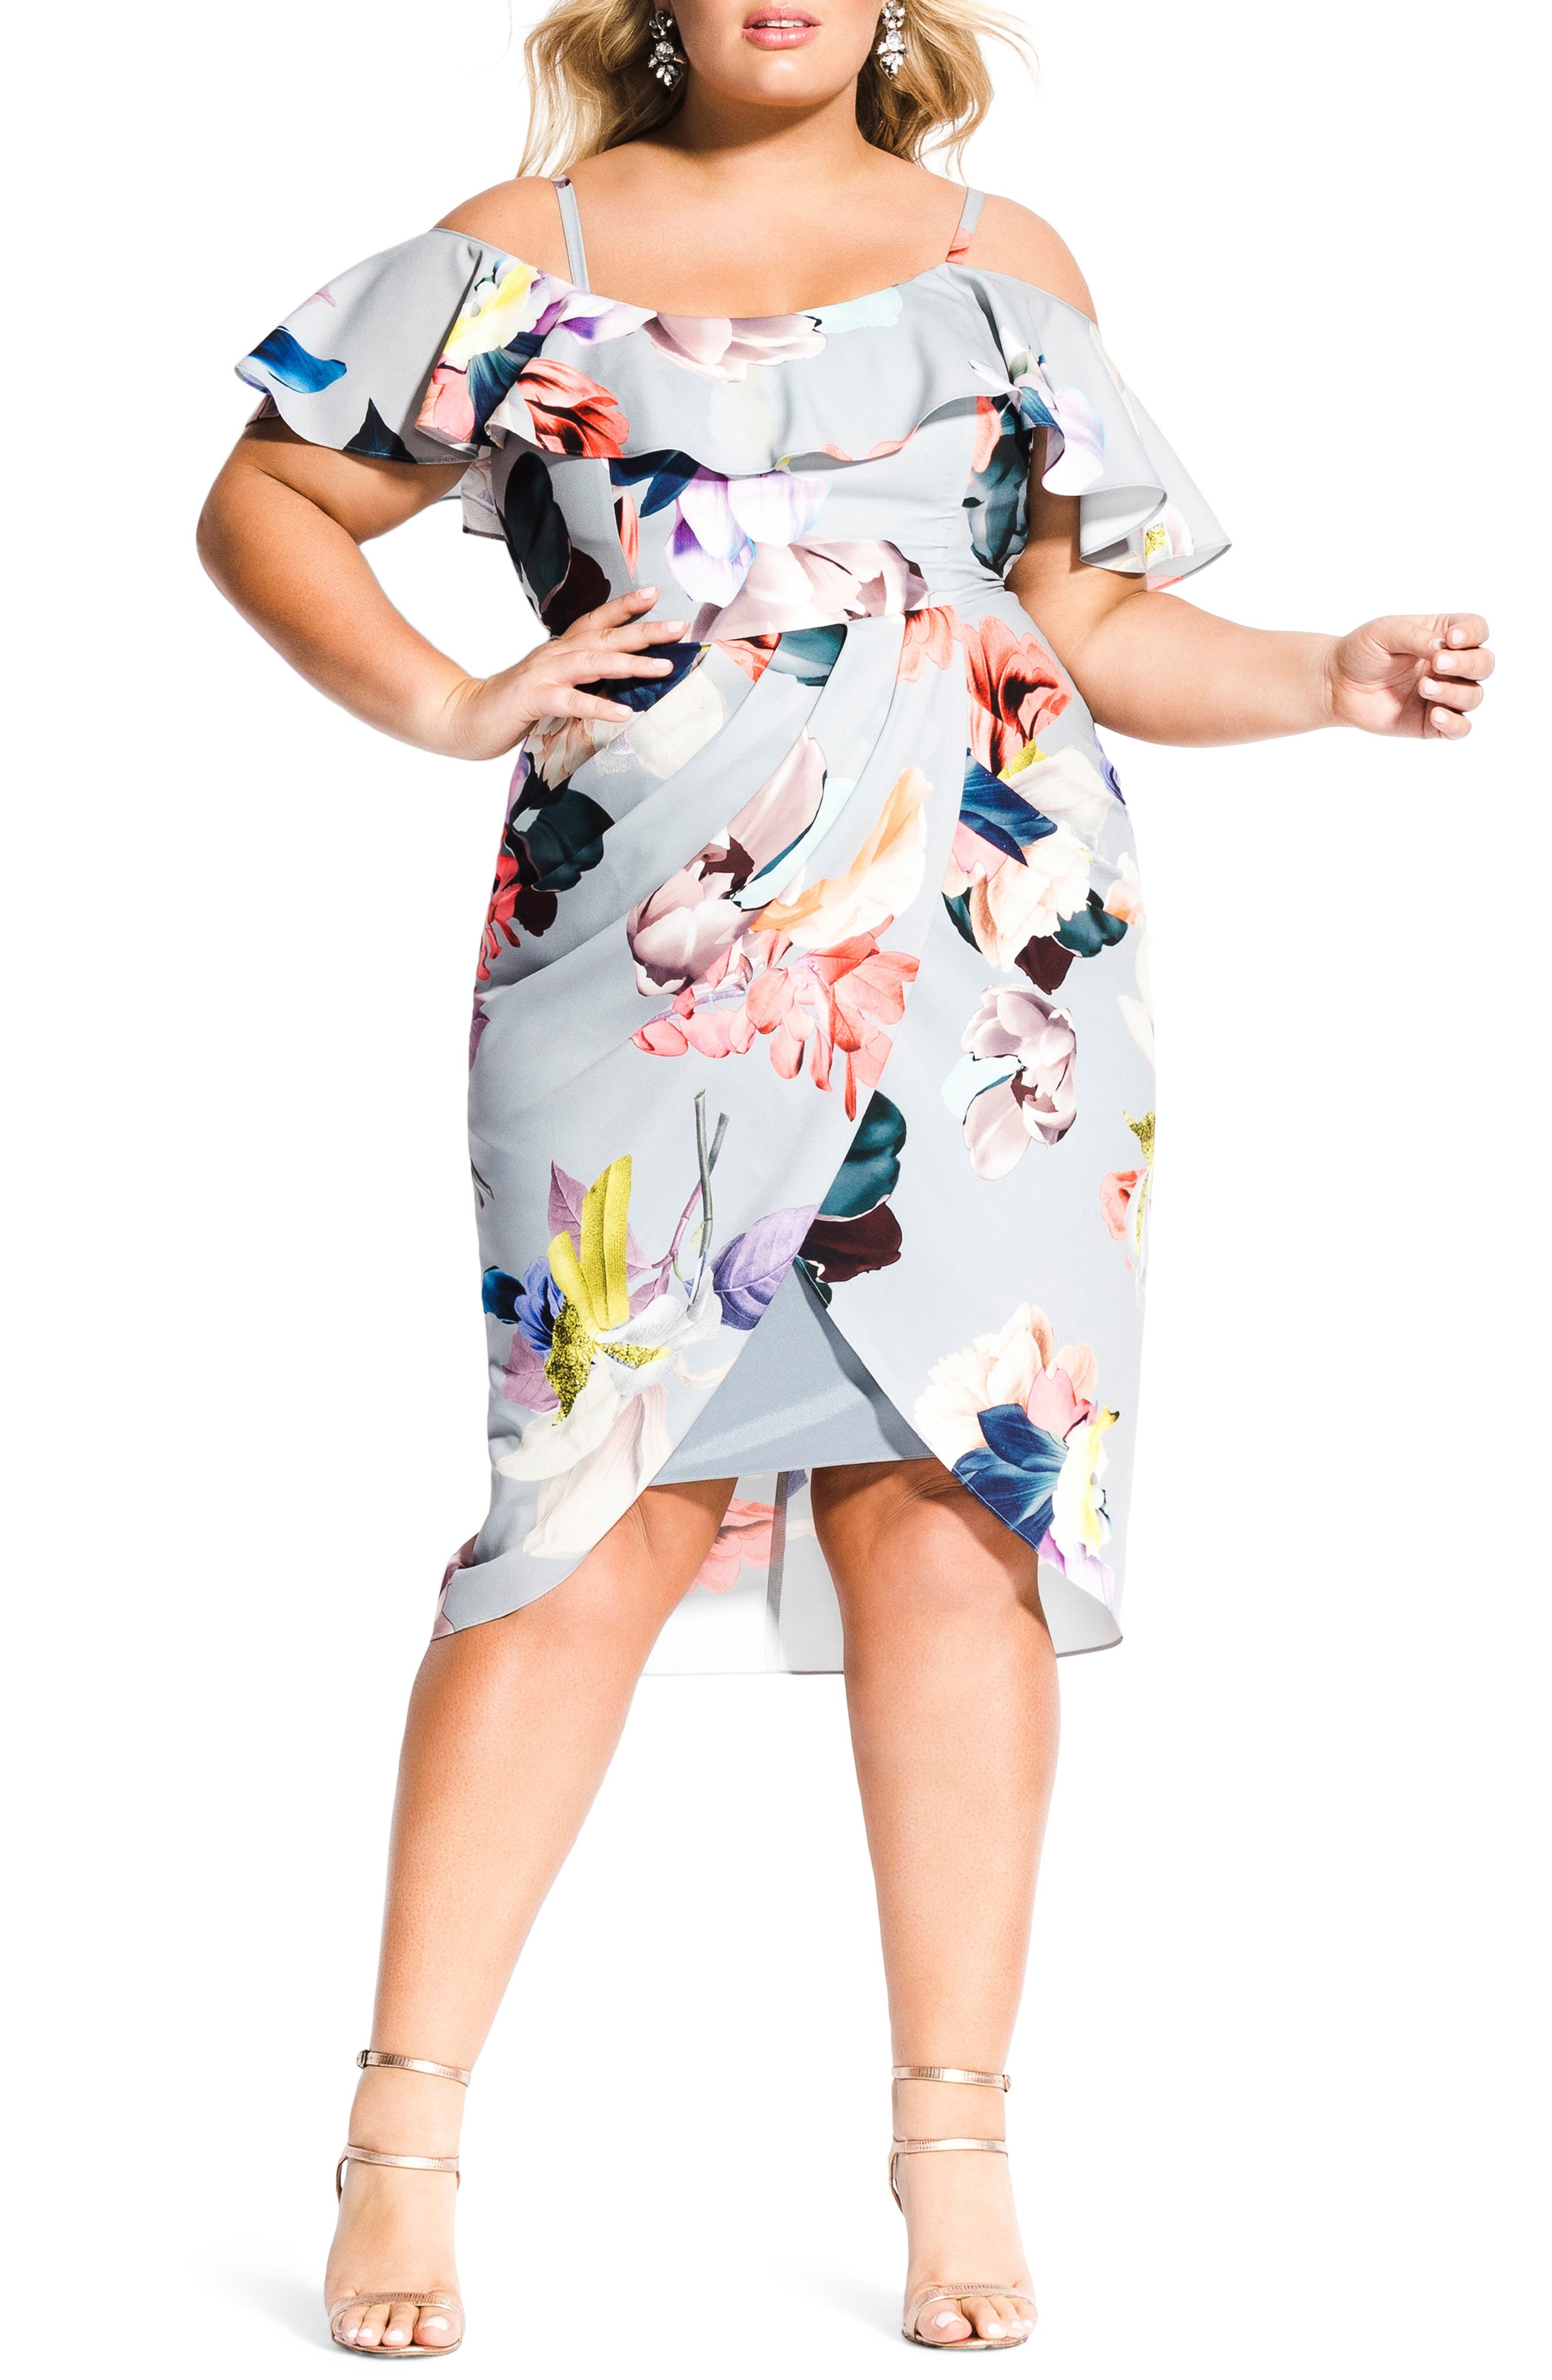 CITY CHIC Contempo Cold Shoulder Floral Dress, Main, color, CONTEMPORARY FL